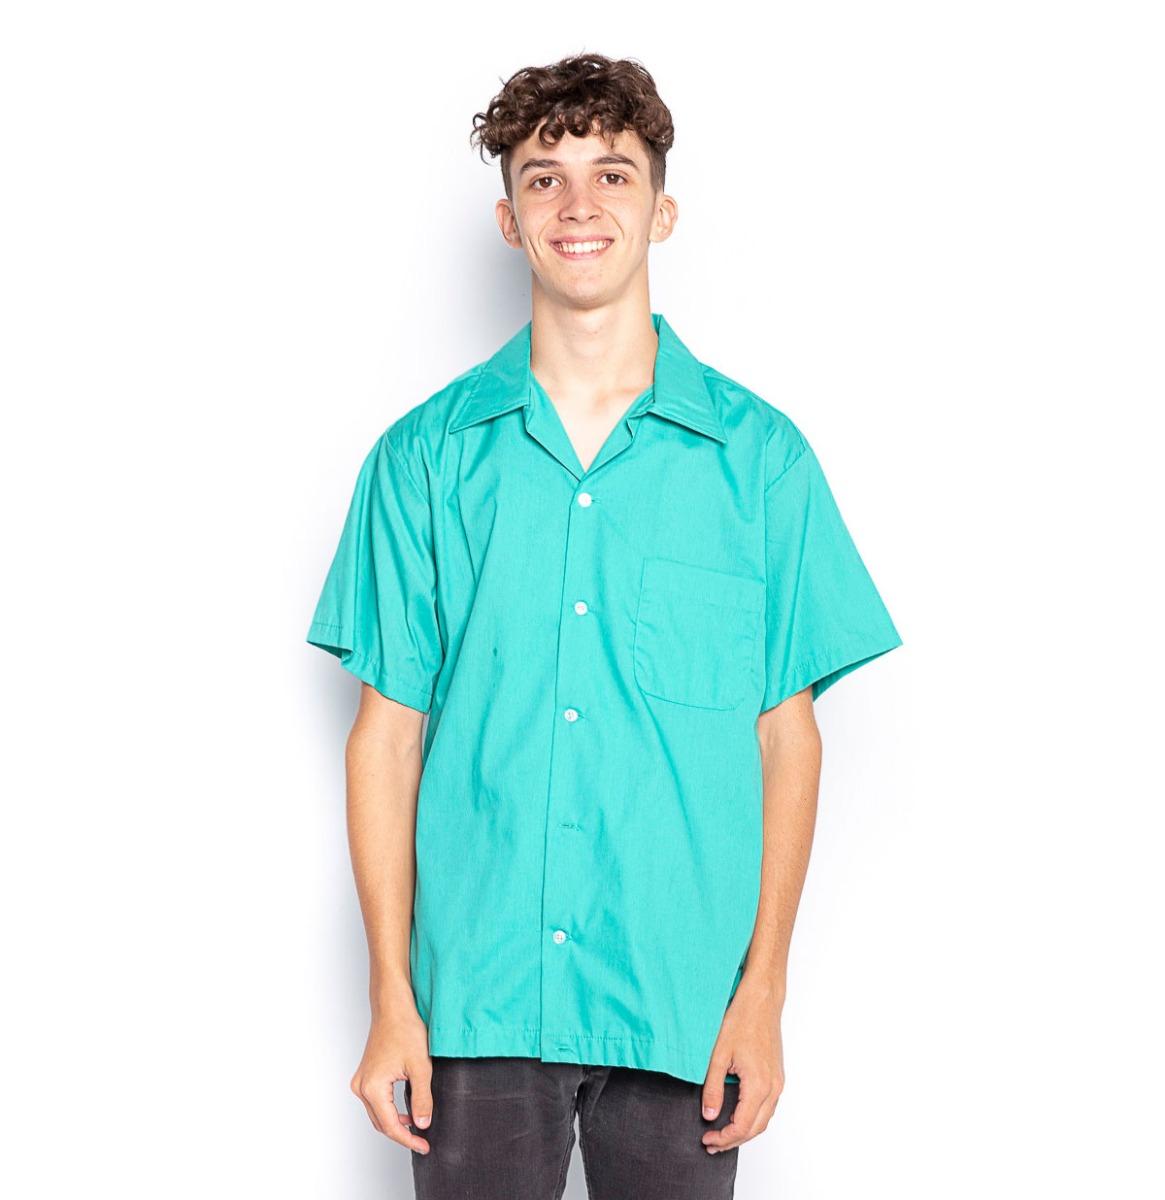 Bowling Shirt Plain Turquoise - Large (Gebruikt)